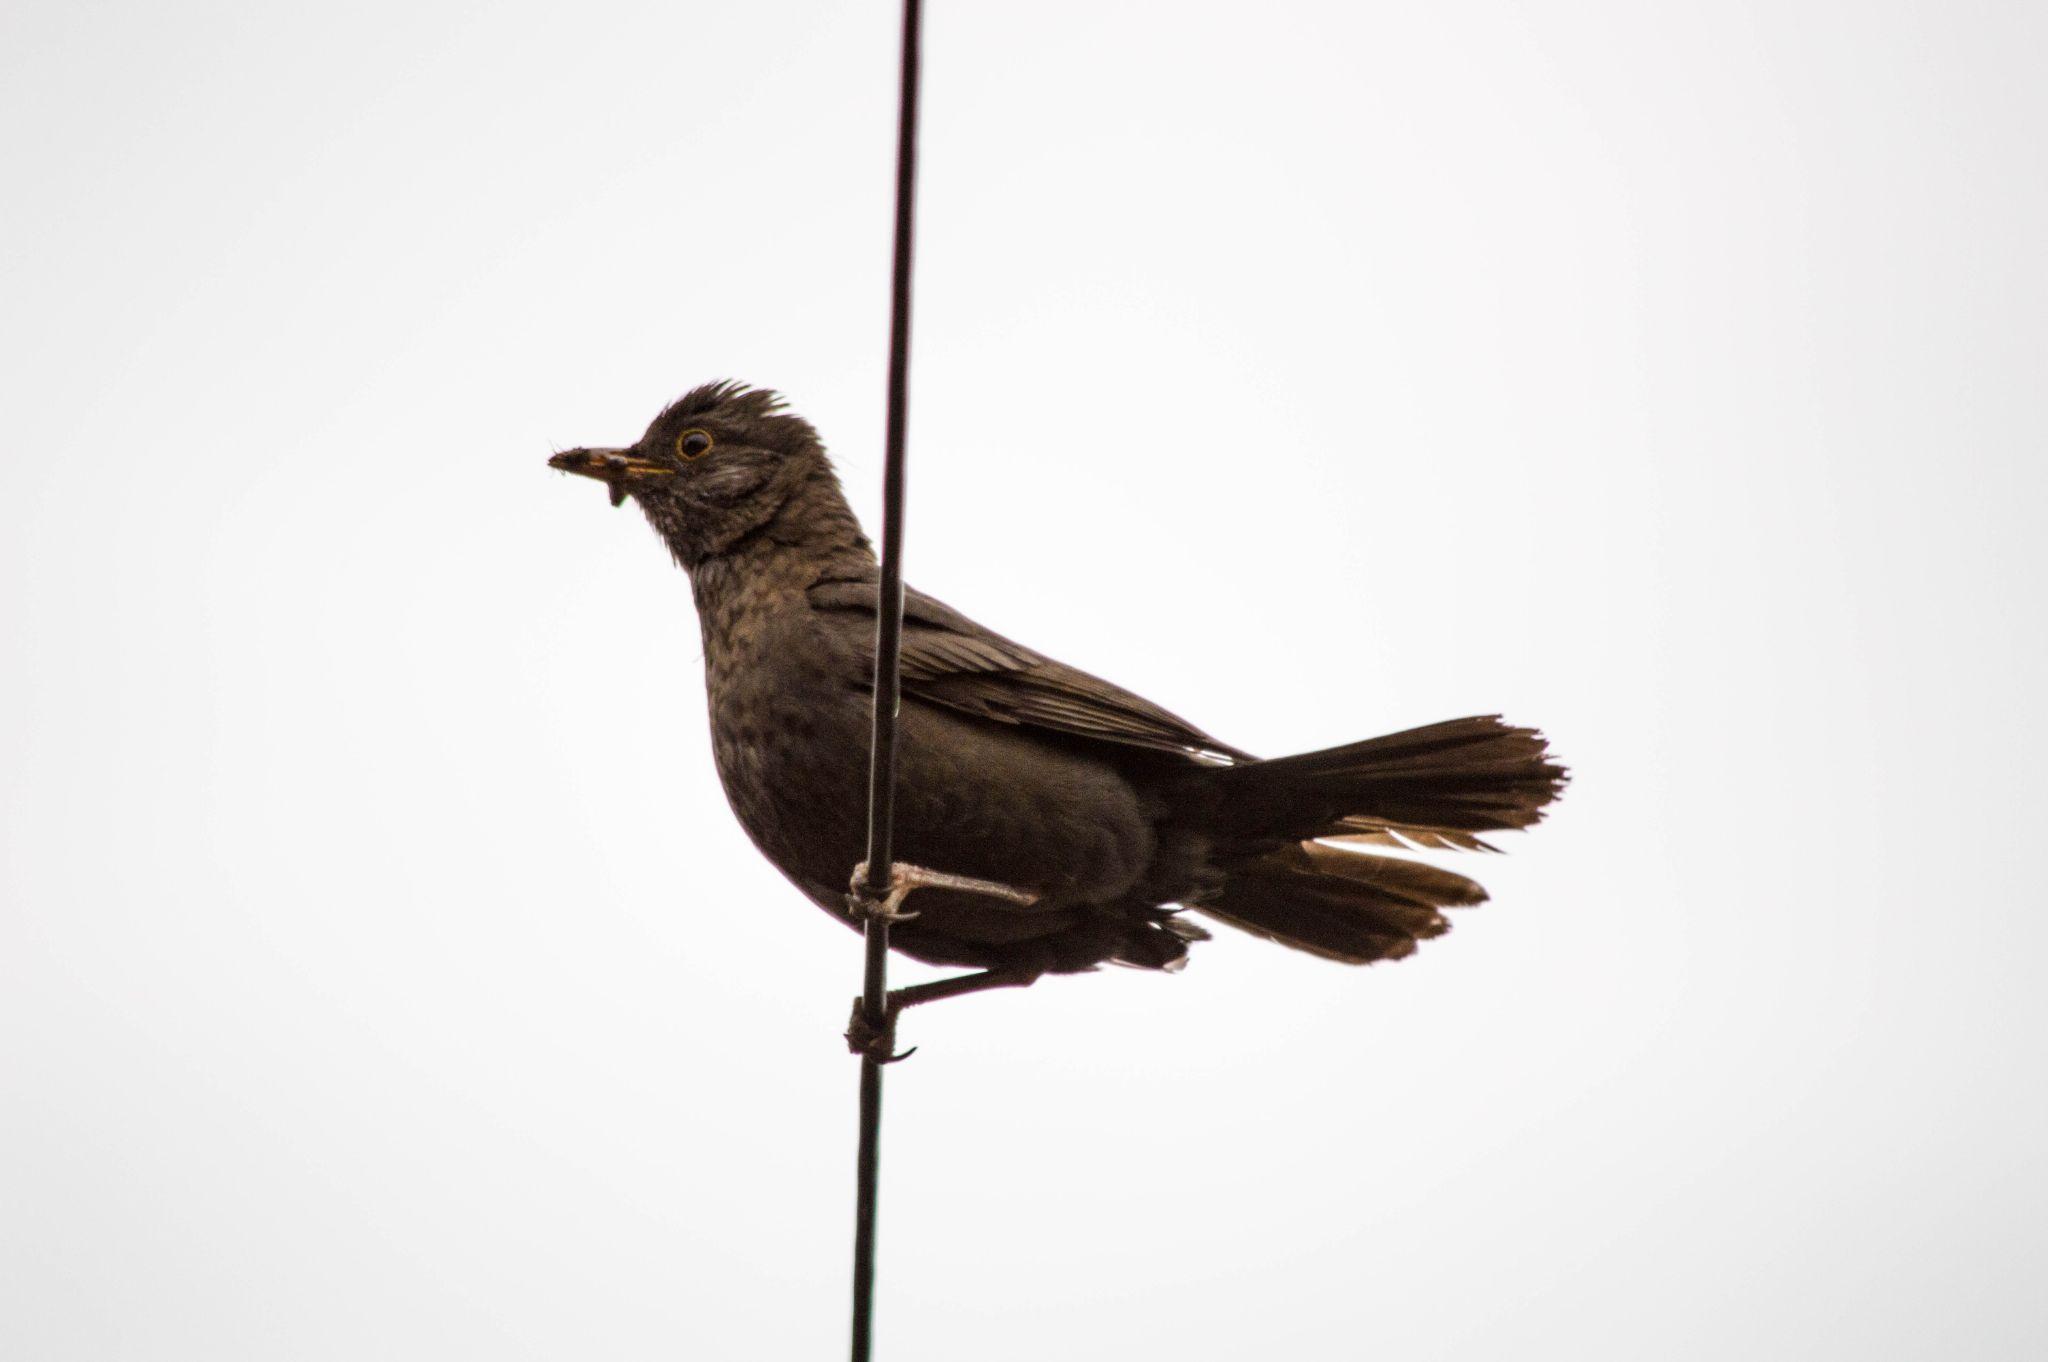 female blackbird by Robert Stephenson